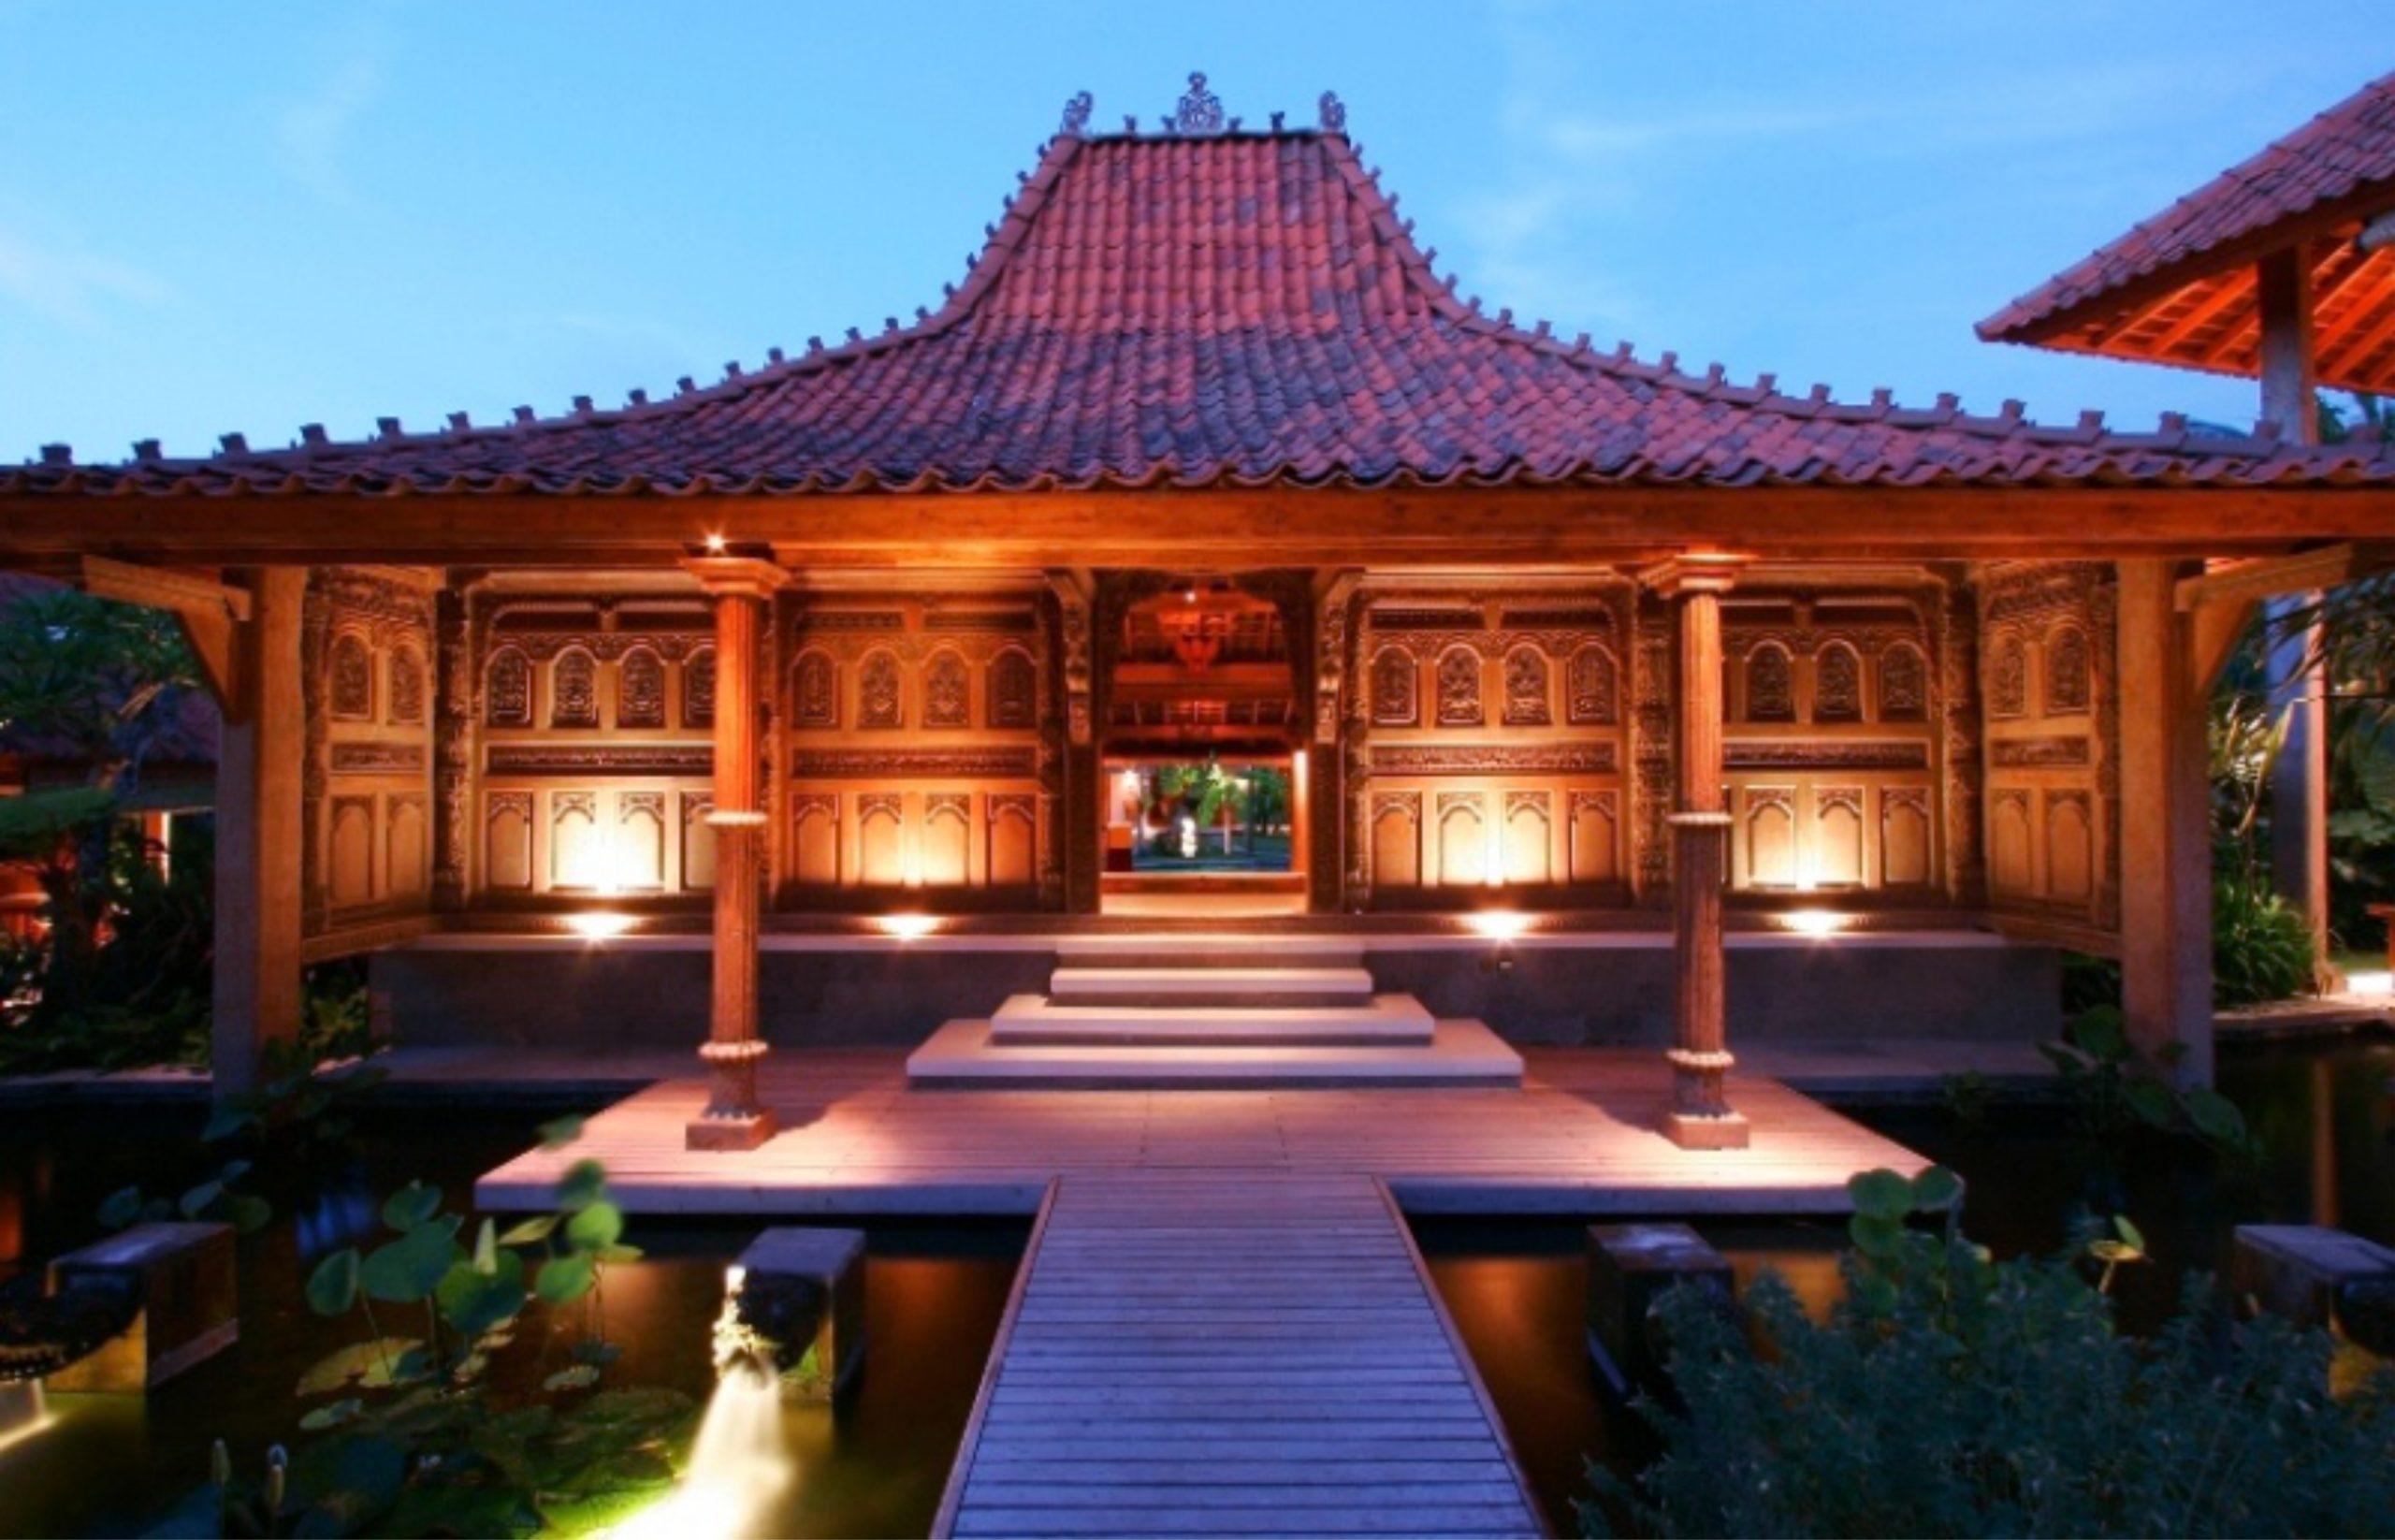 Rumah Adat provinsi Yogyakarta